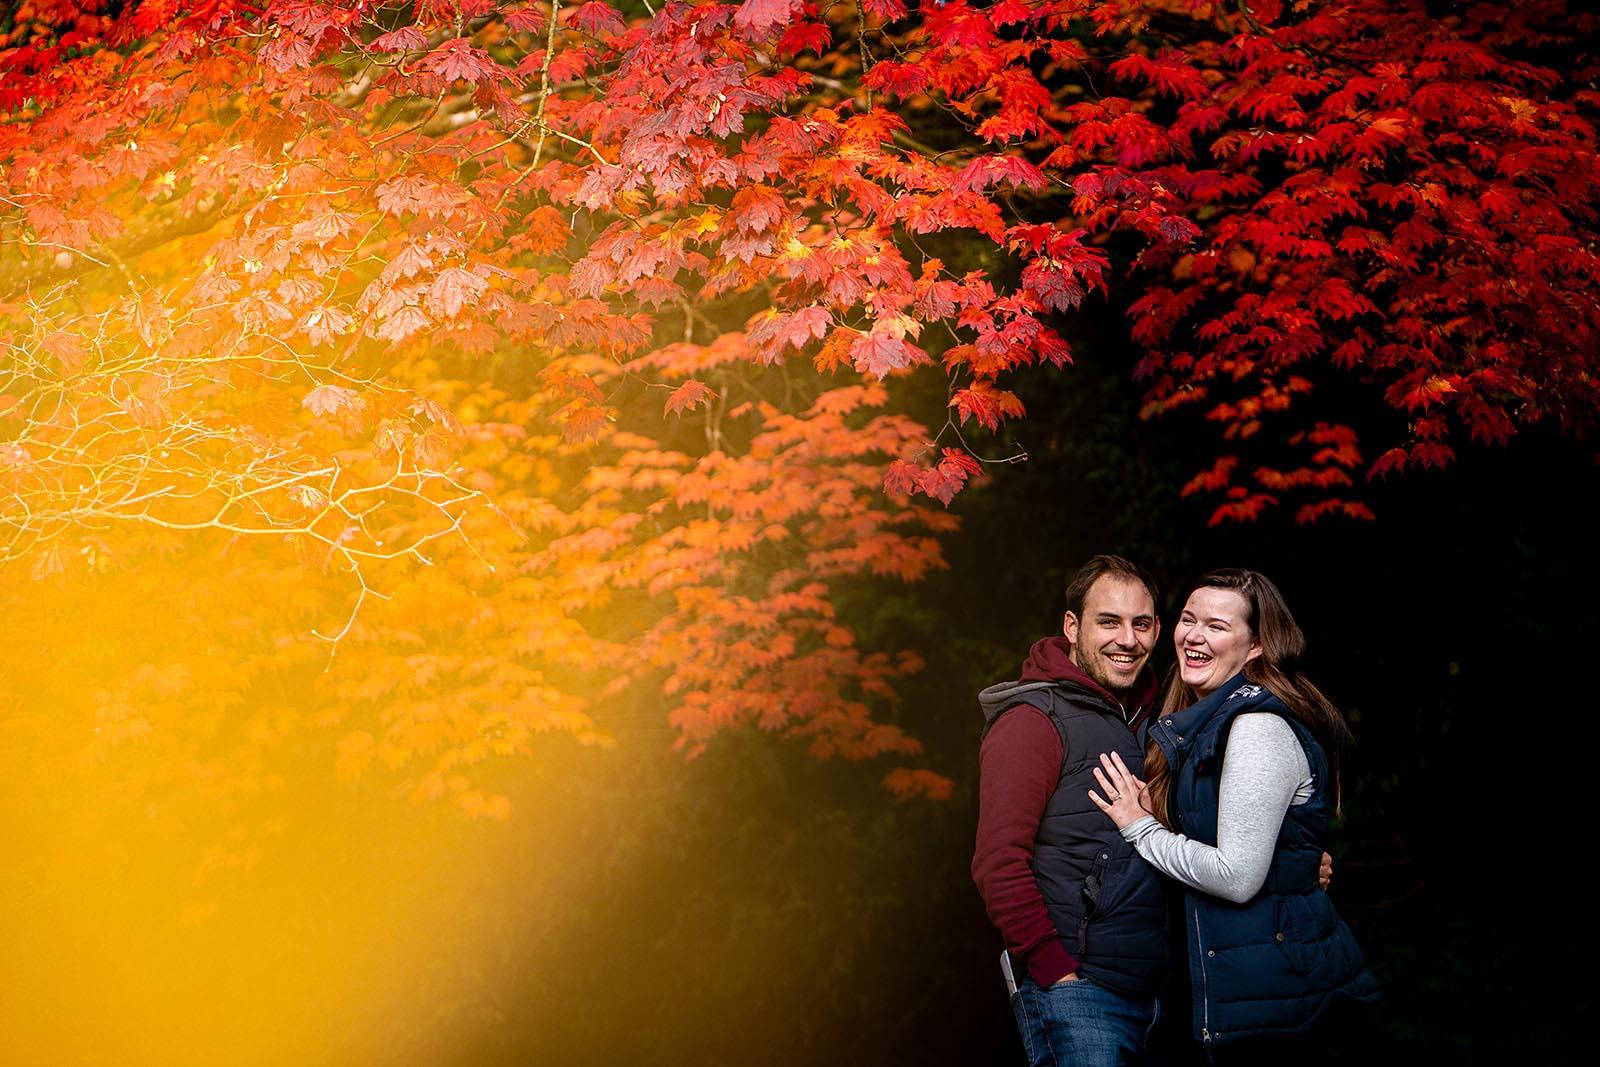 westonbirt arboretum engagement shoot